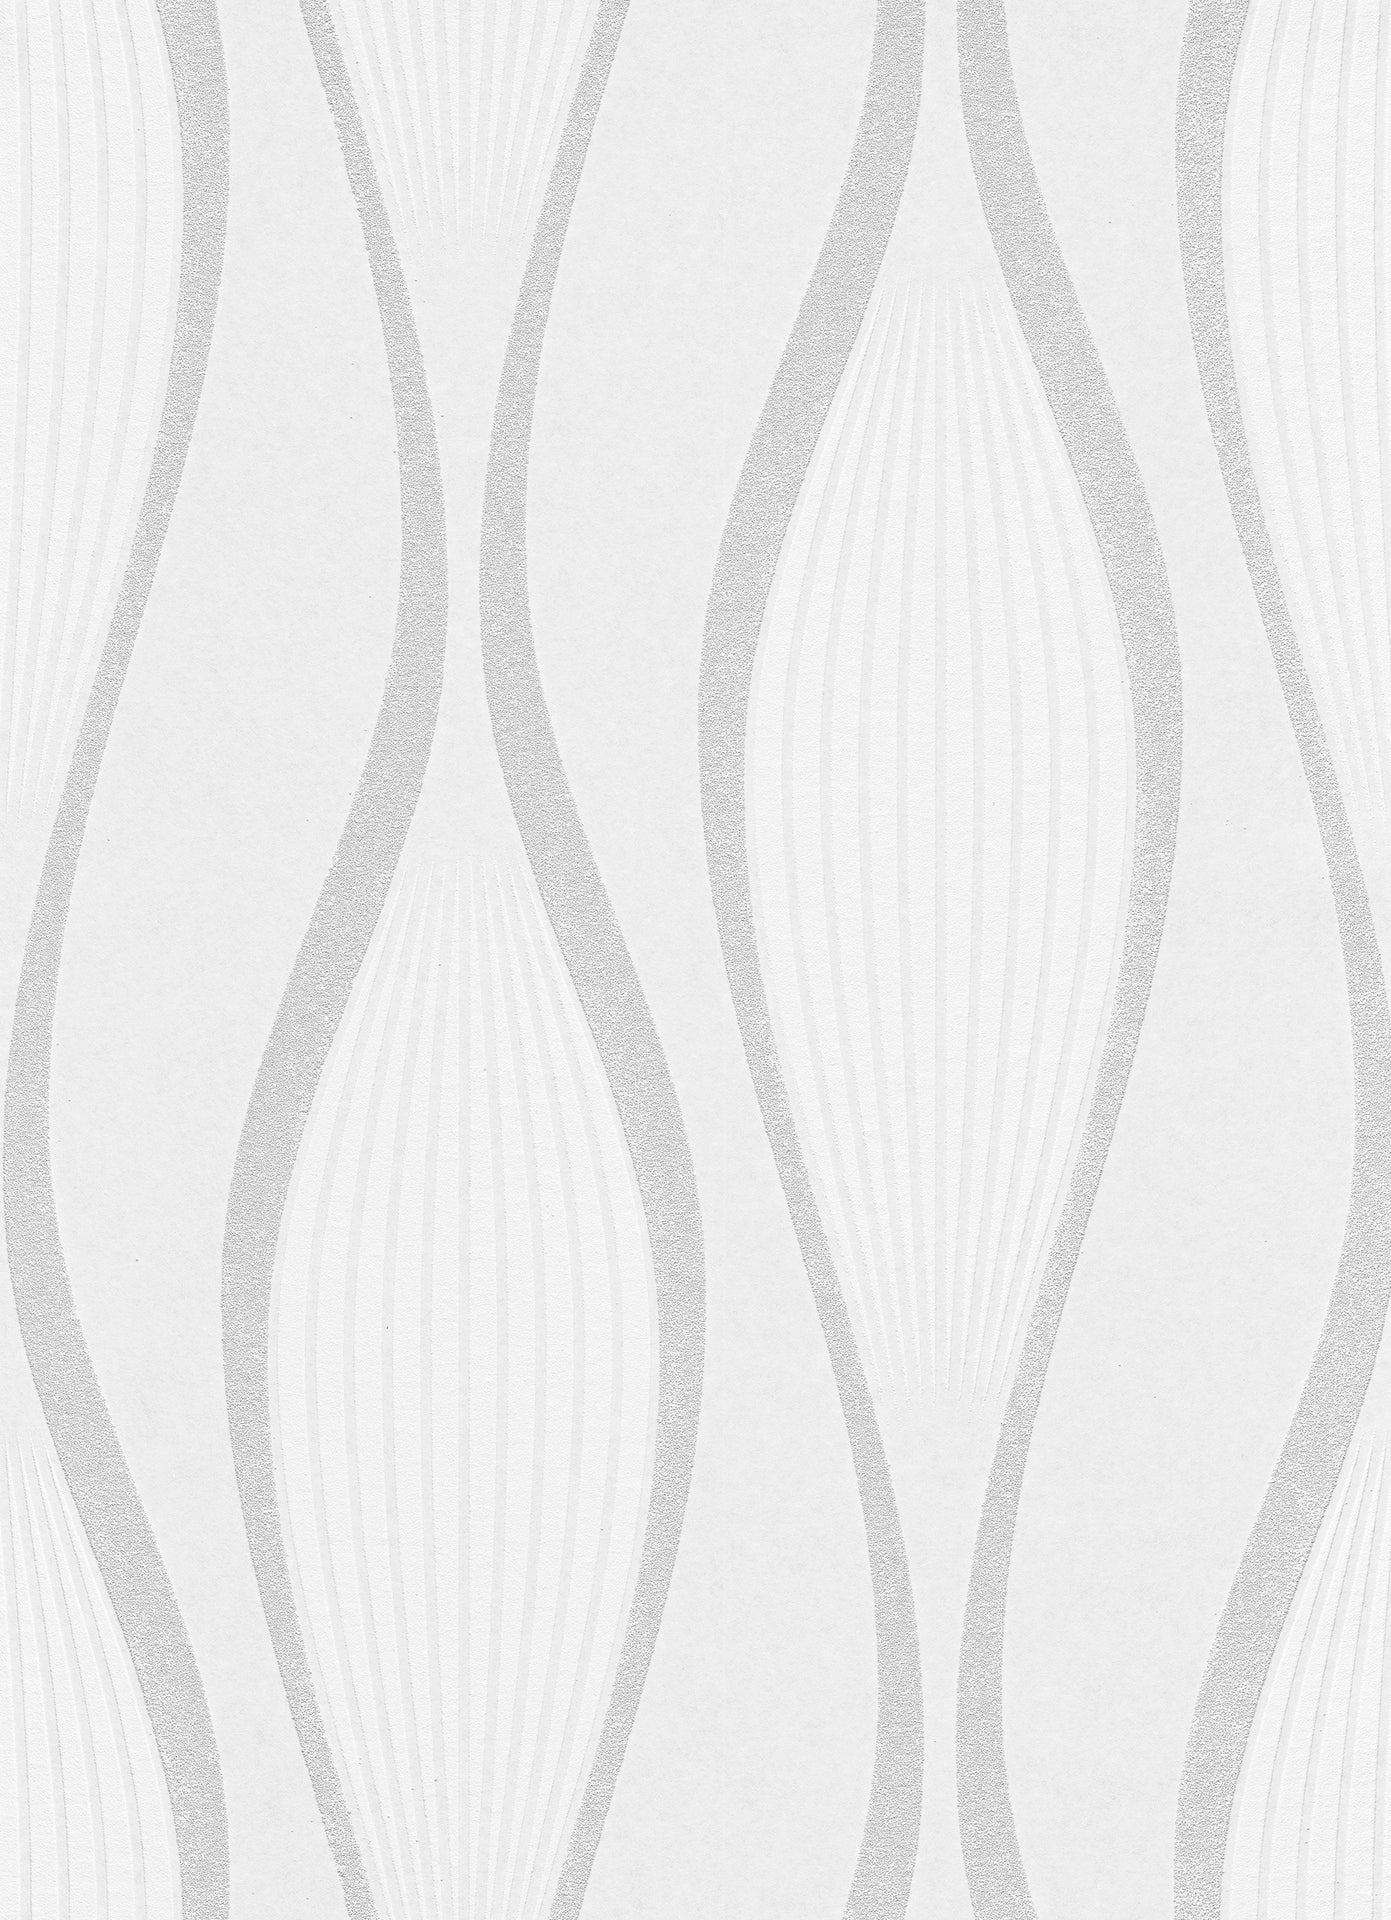 Papier Peint Intisse 250g M Ondulation Blanc A Peindre Leroy Merlin